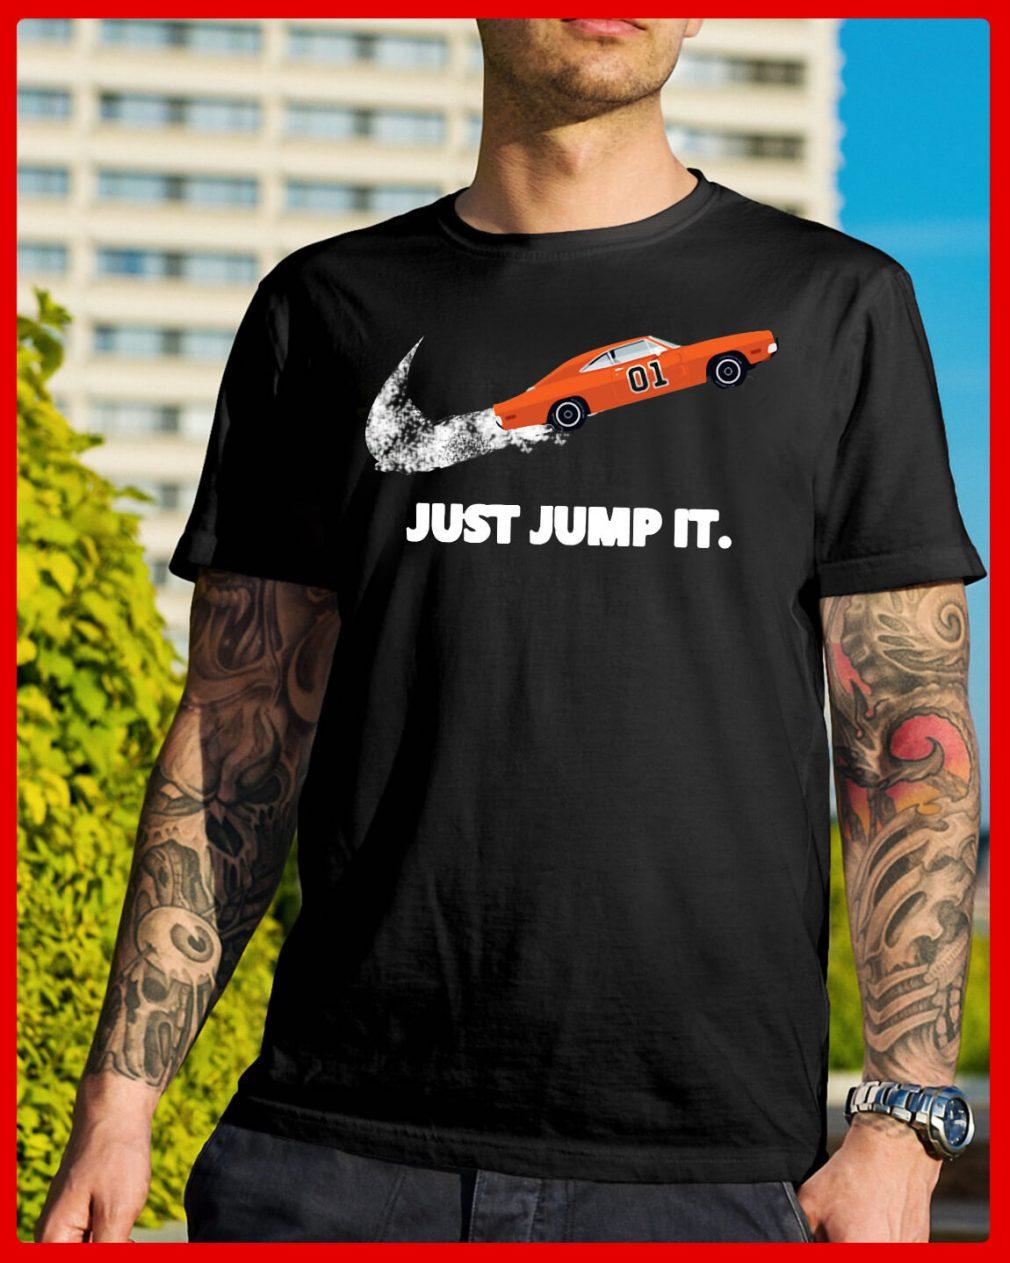 The Dukes of Hazzard 01 just jump it shirt